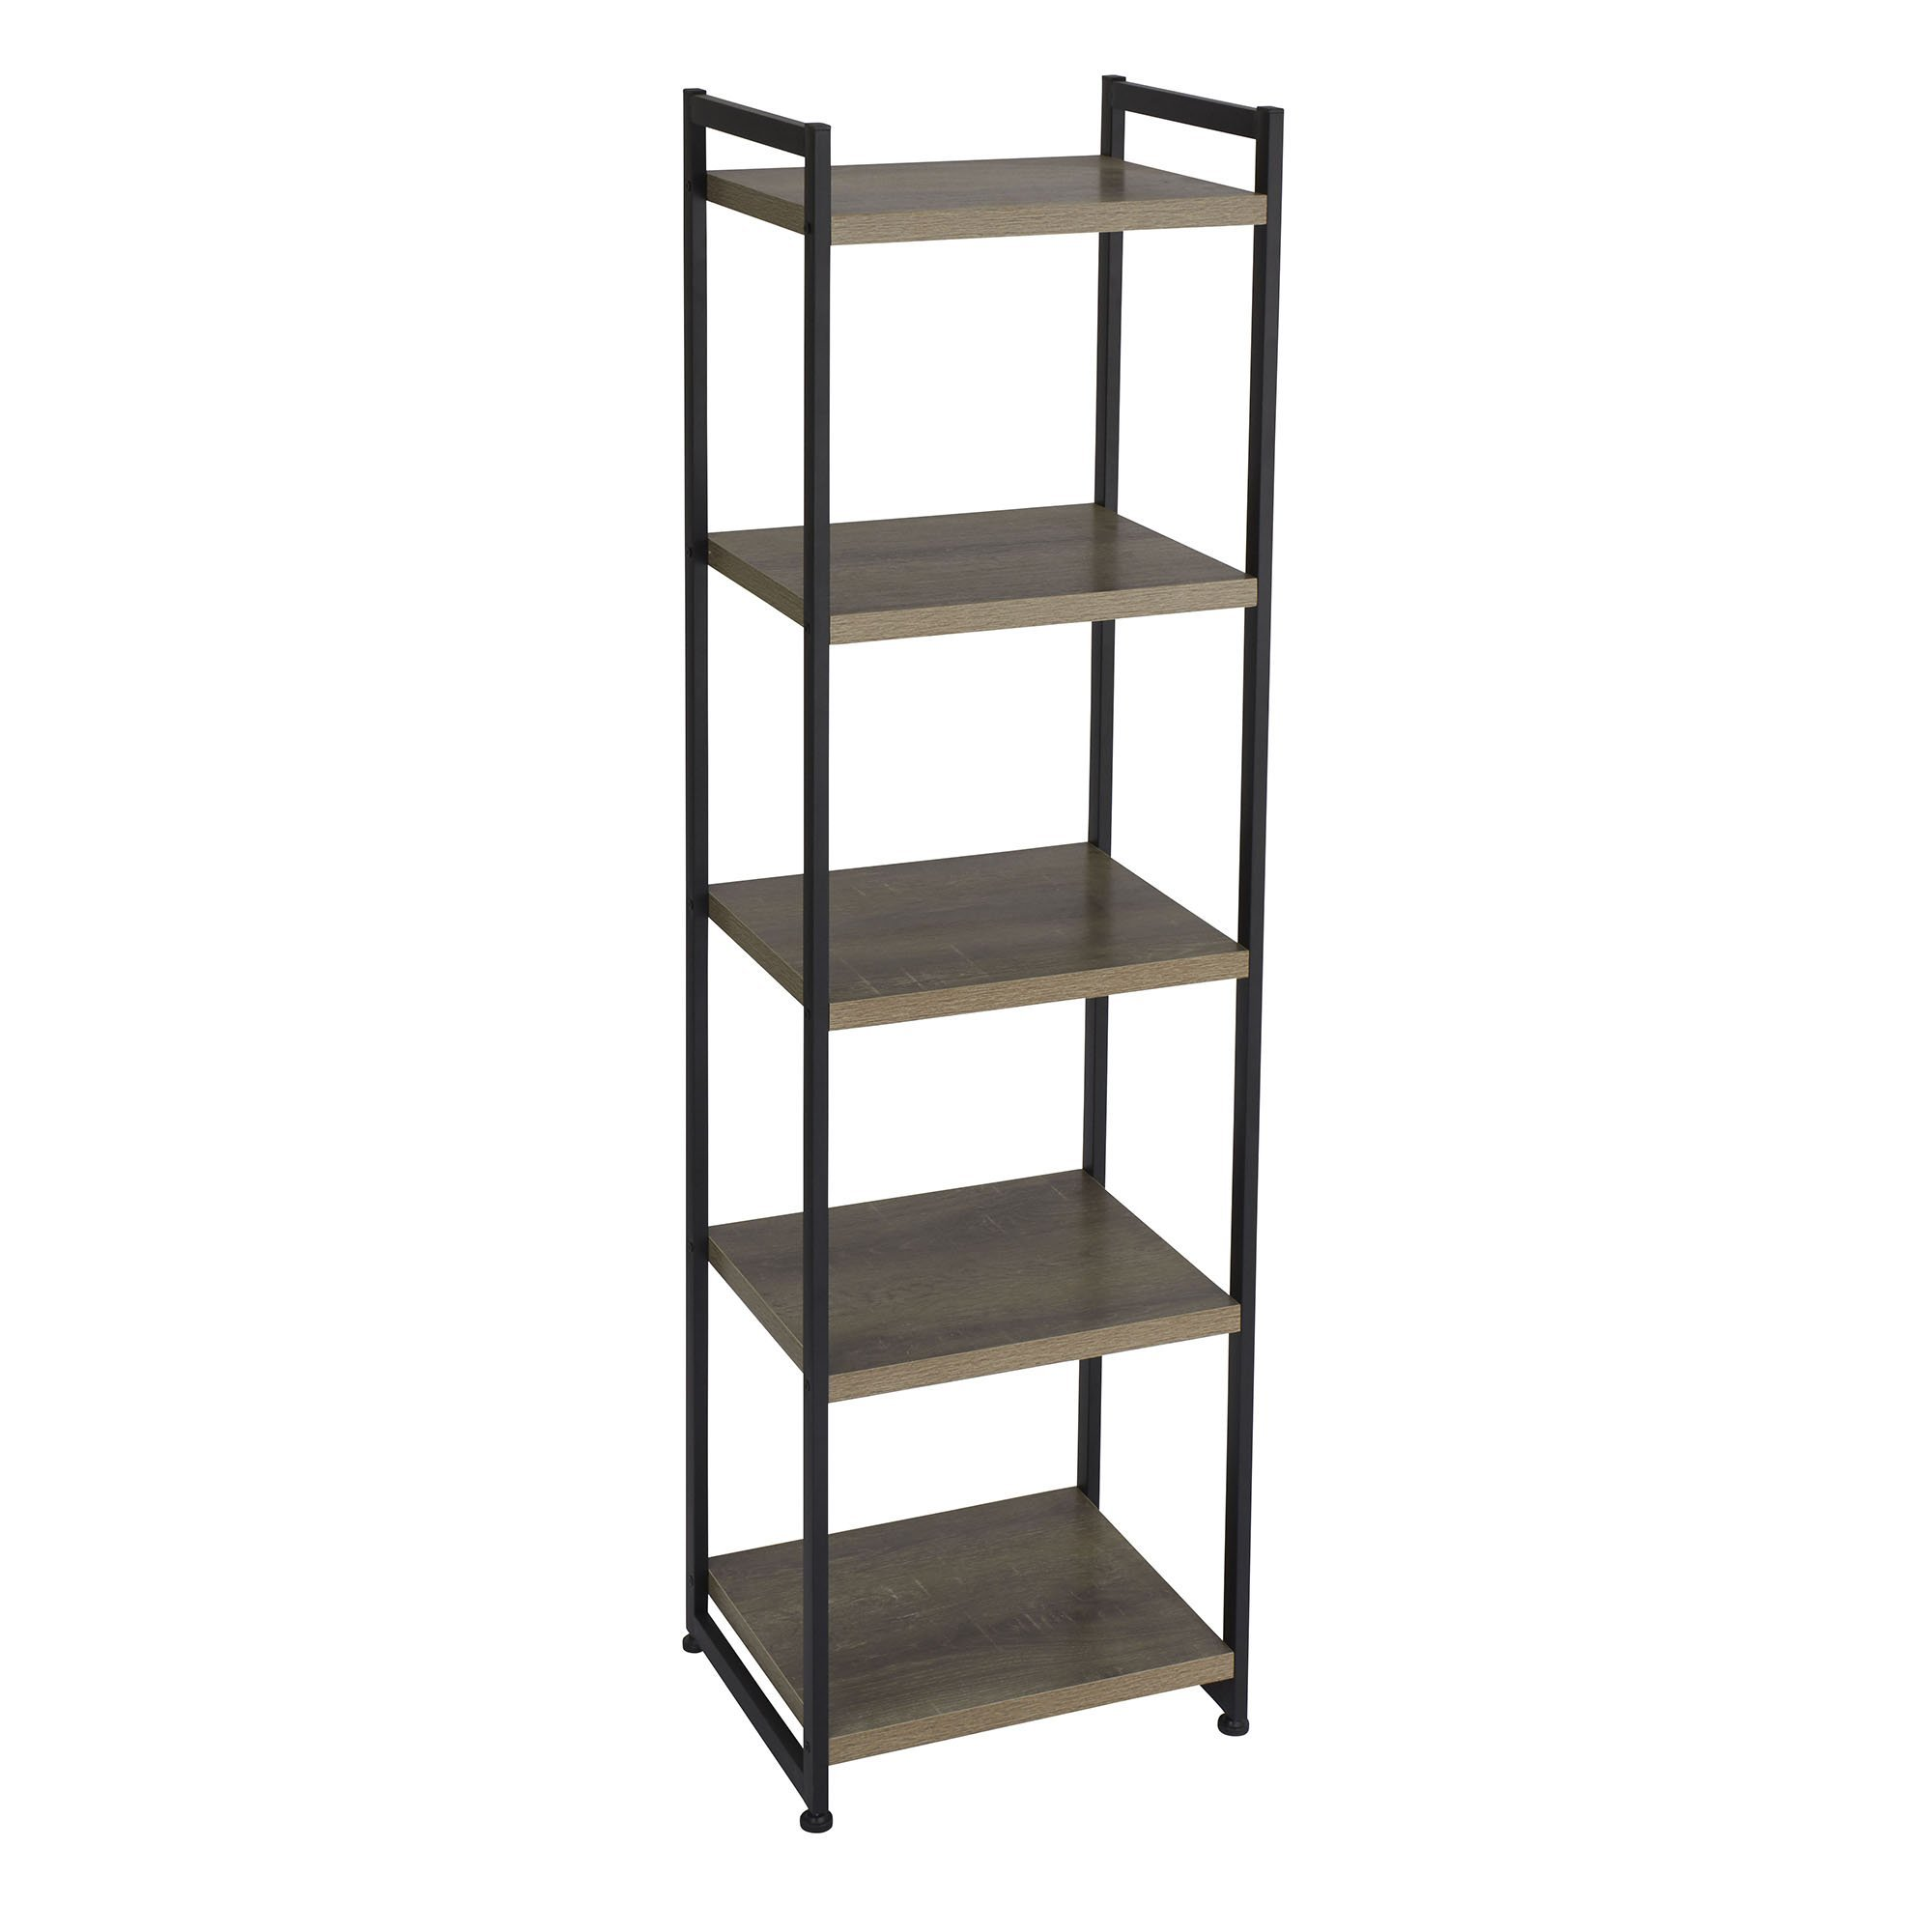 Household Essentials 8075-1 Ashwood Storage Unit | 54 Tier Shelf | Gray-Brown